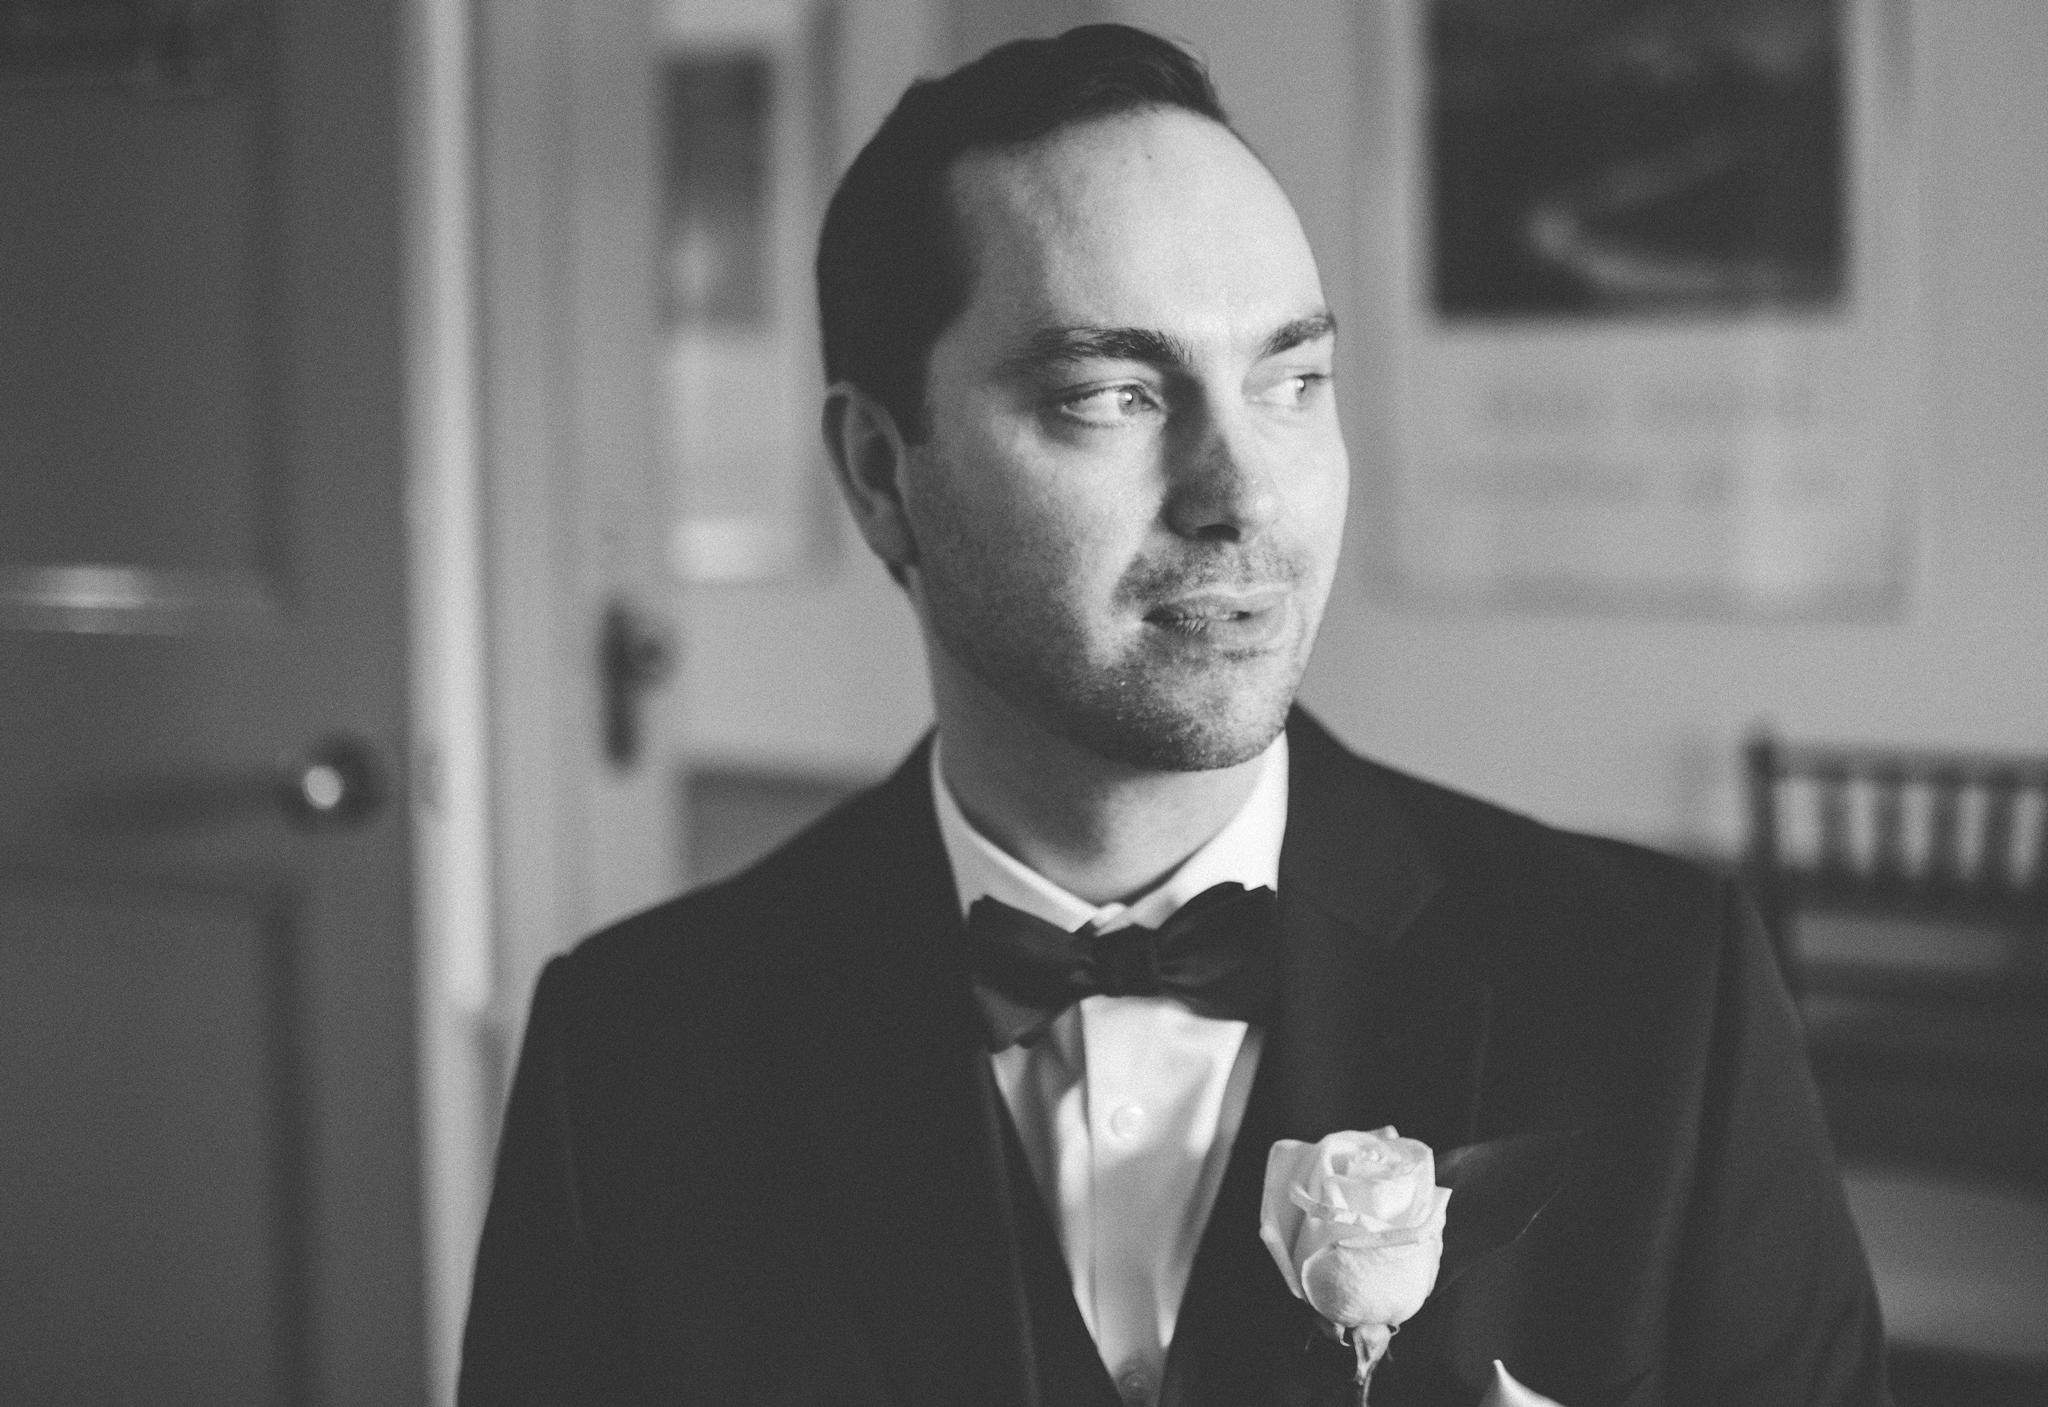 IMG_5177-VANCOUVER-WEDDING-PHOTOGRAPHER-JENNIFER-PICARD-PHOTOGRAPHY.jpg